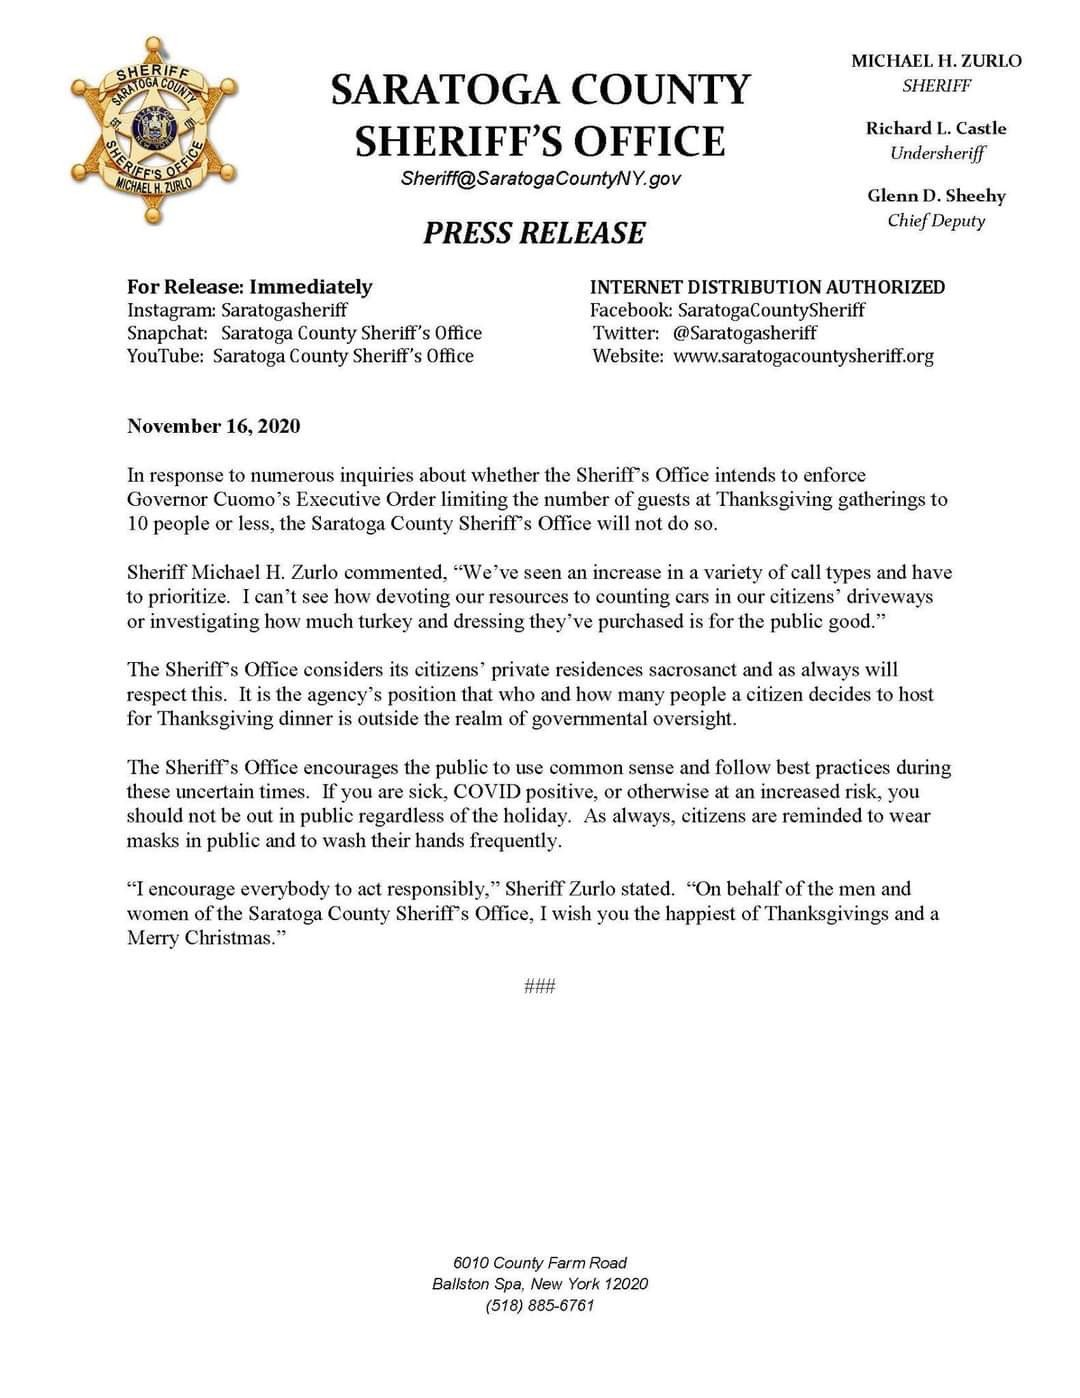 sheriffstatement.jpg